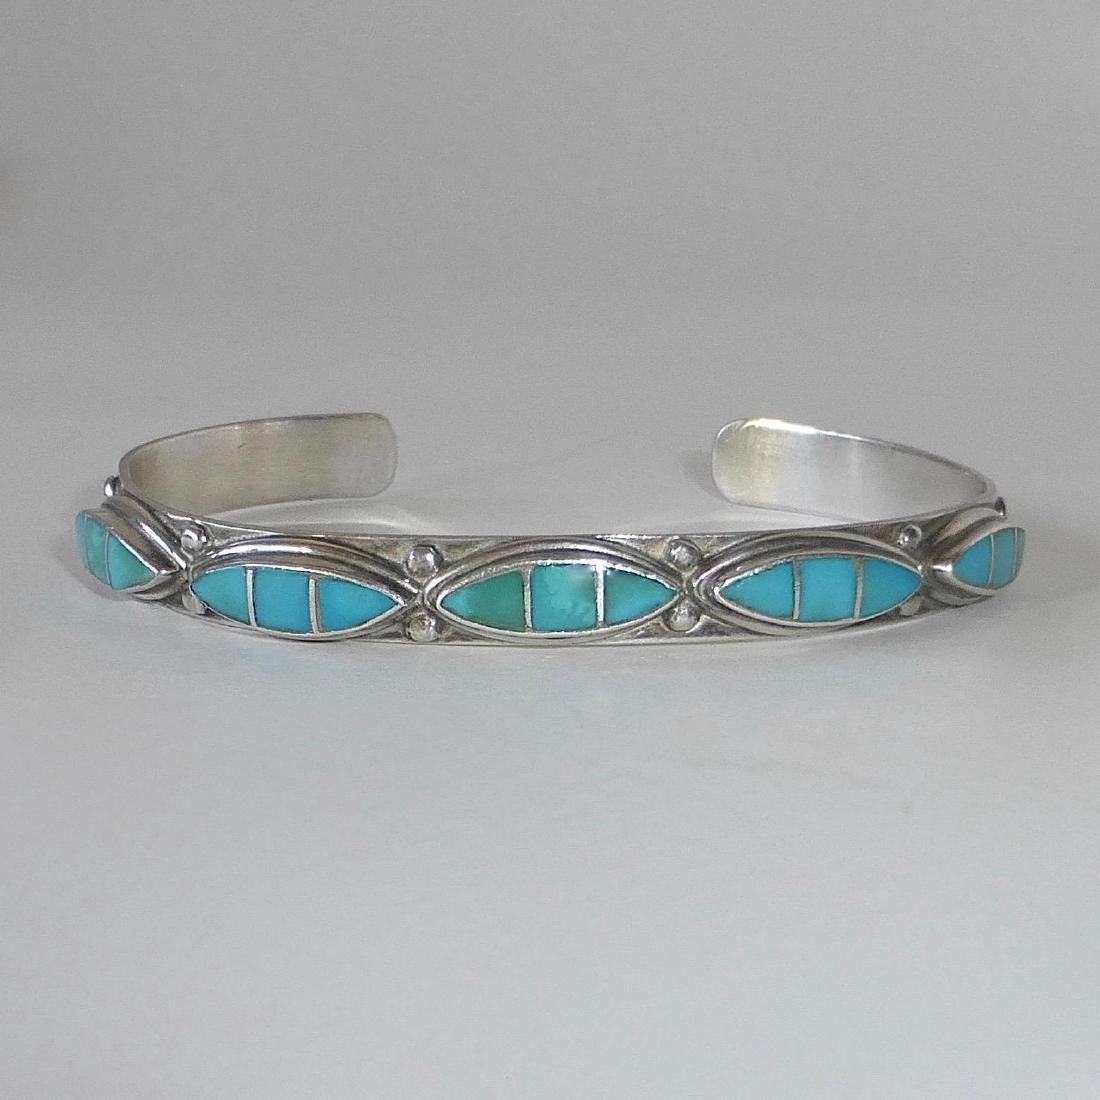 Vintage Southwest Sterling & Turquoise Cuff Bracelet